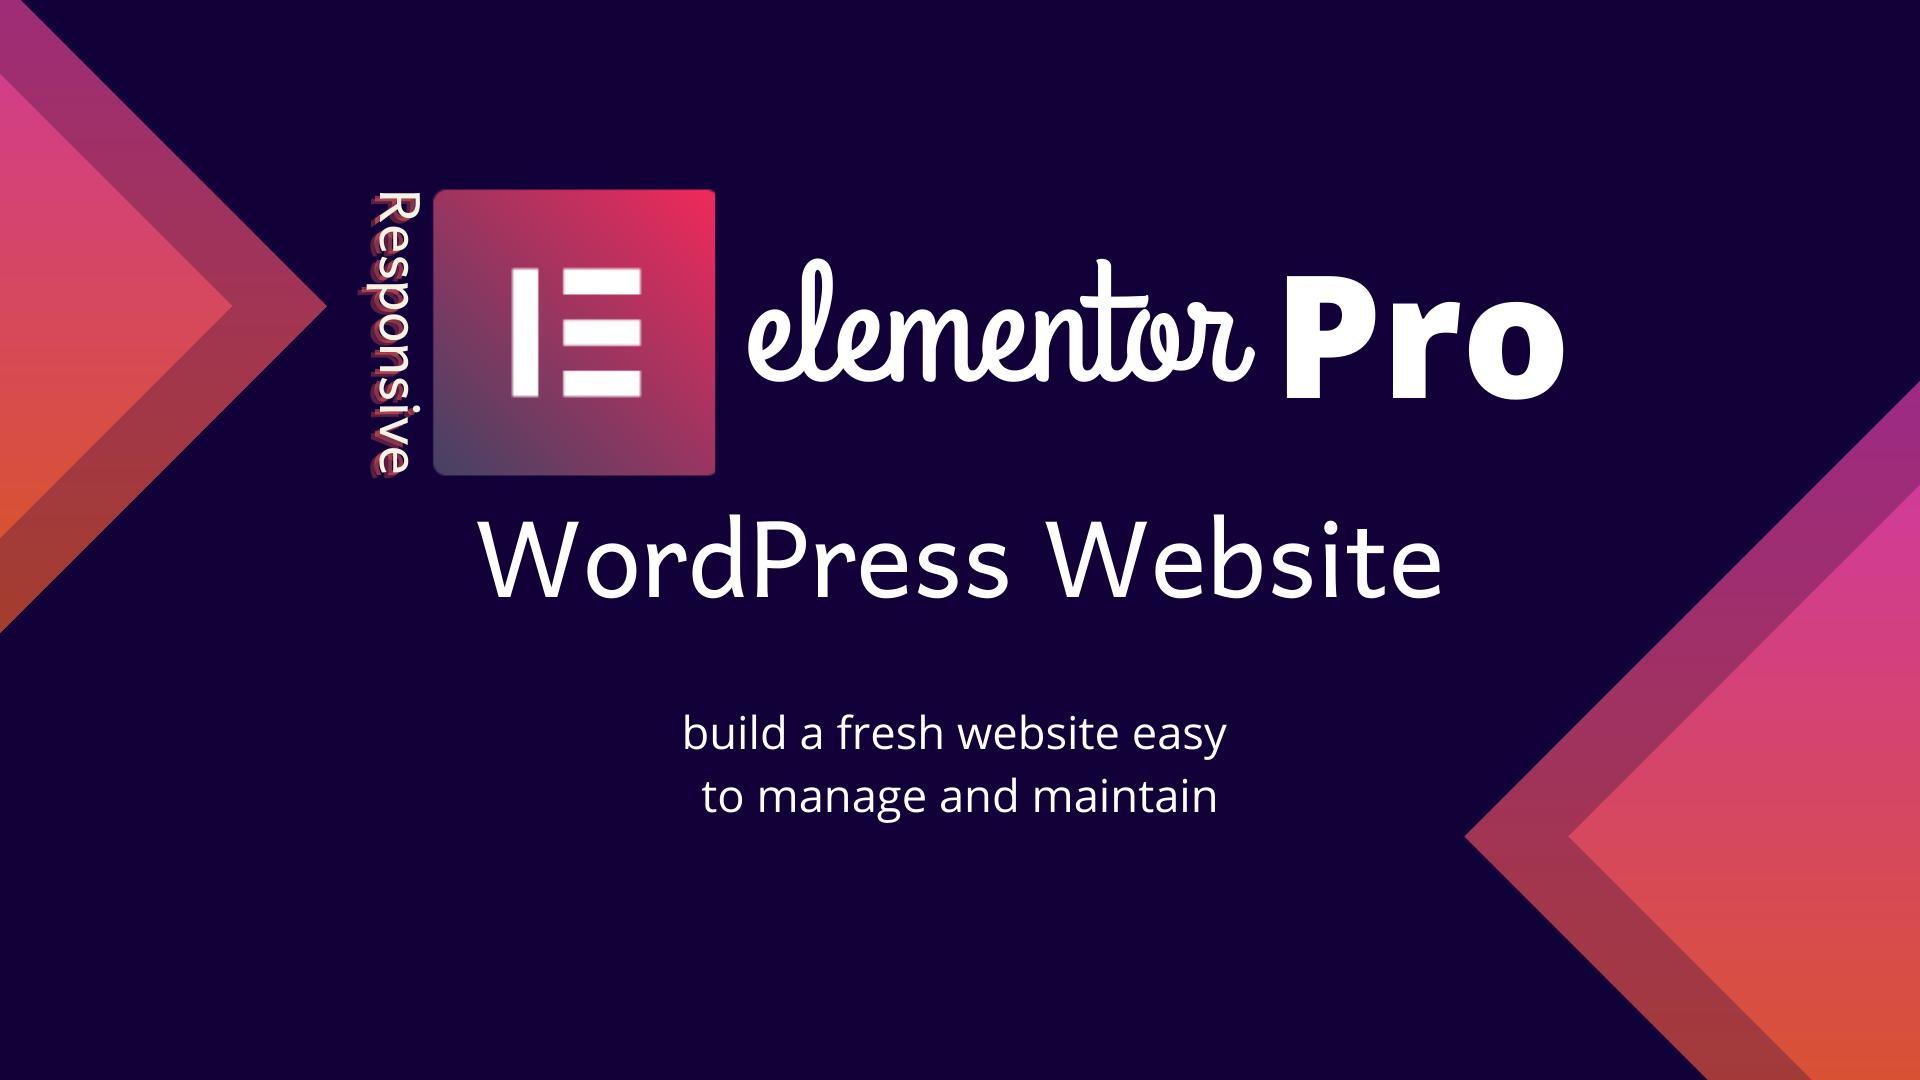 create a premium wordpress website using elementor pro